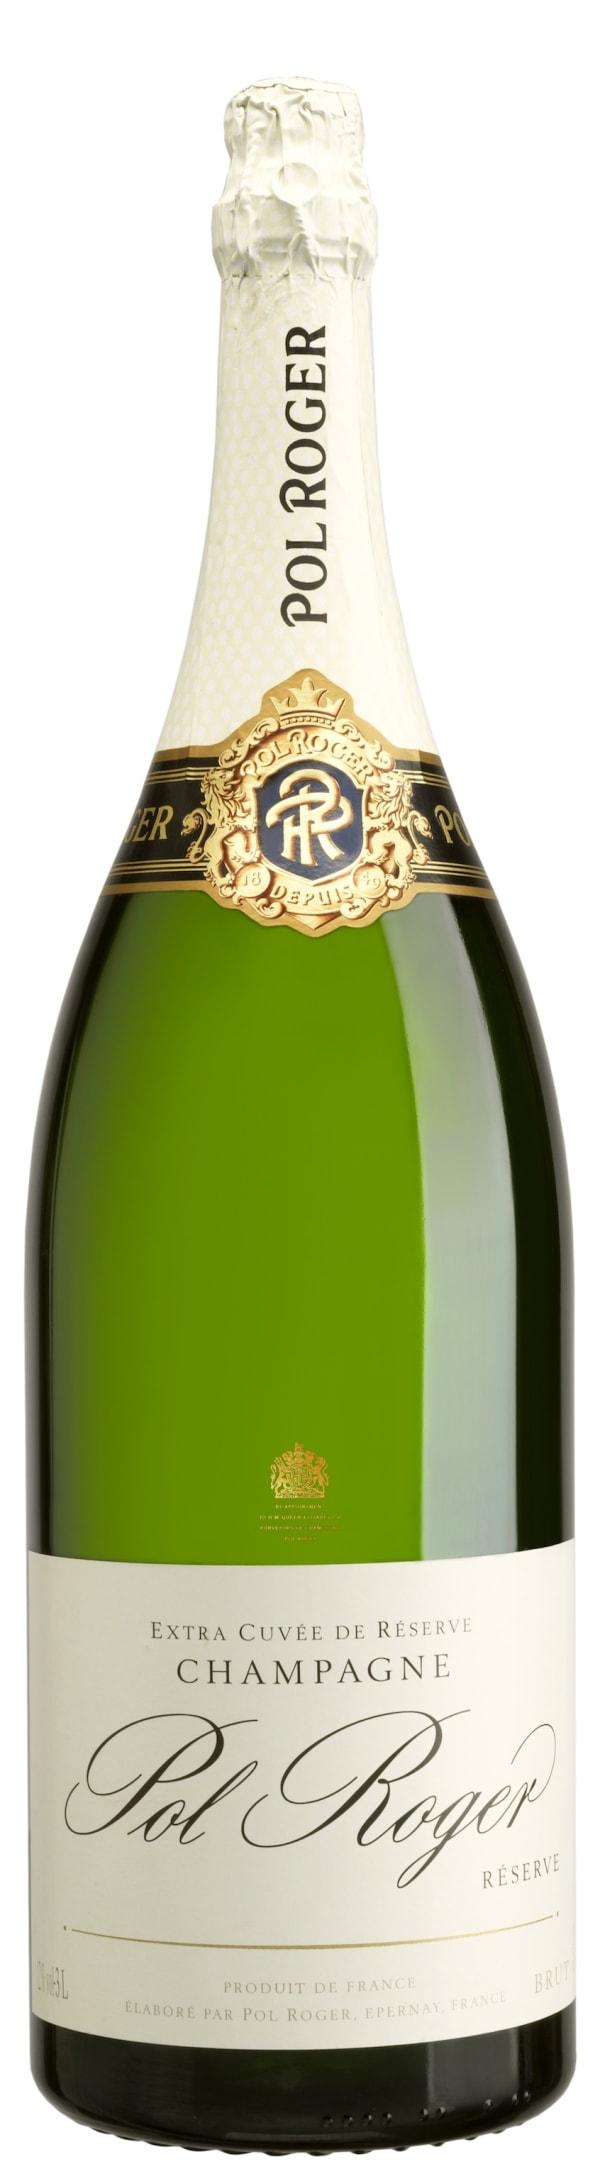 Pol Roger Réserve Champagne Brut Jeroboam